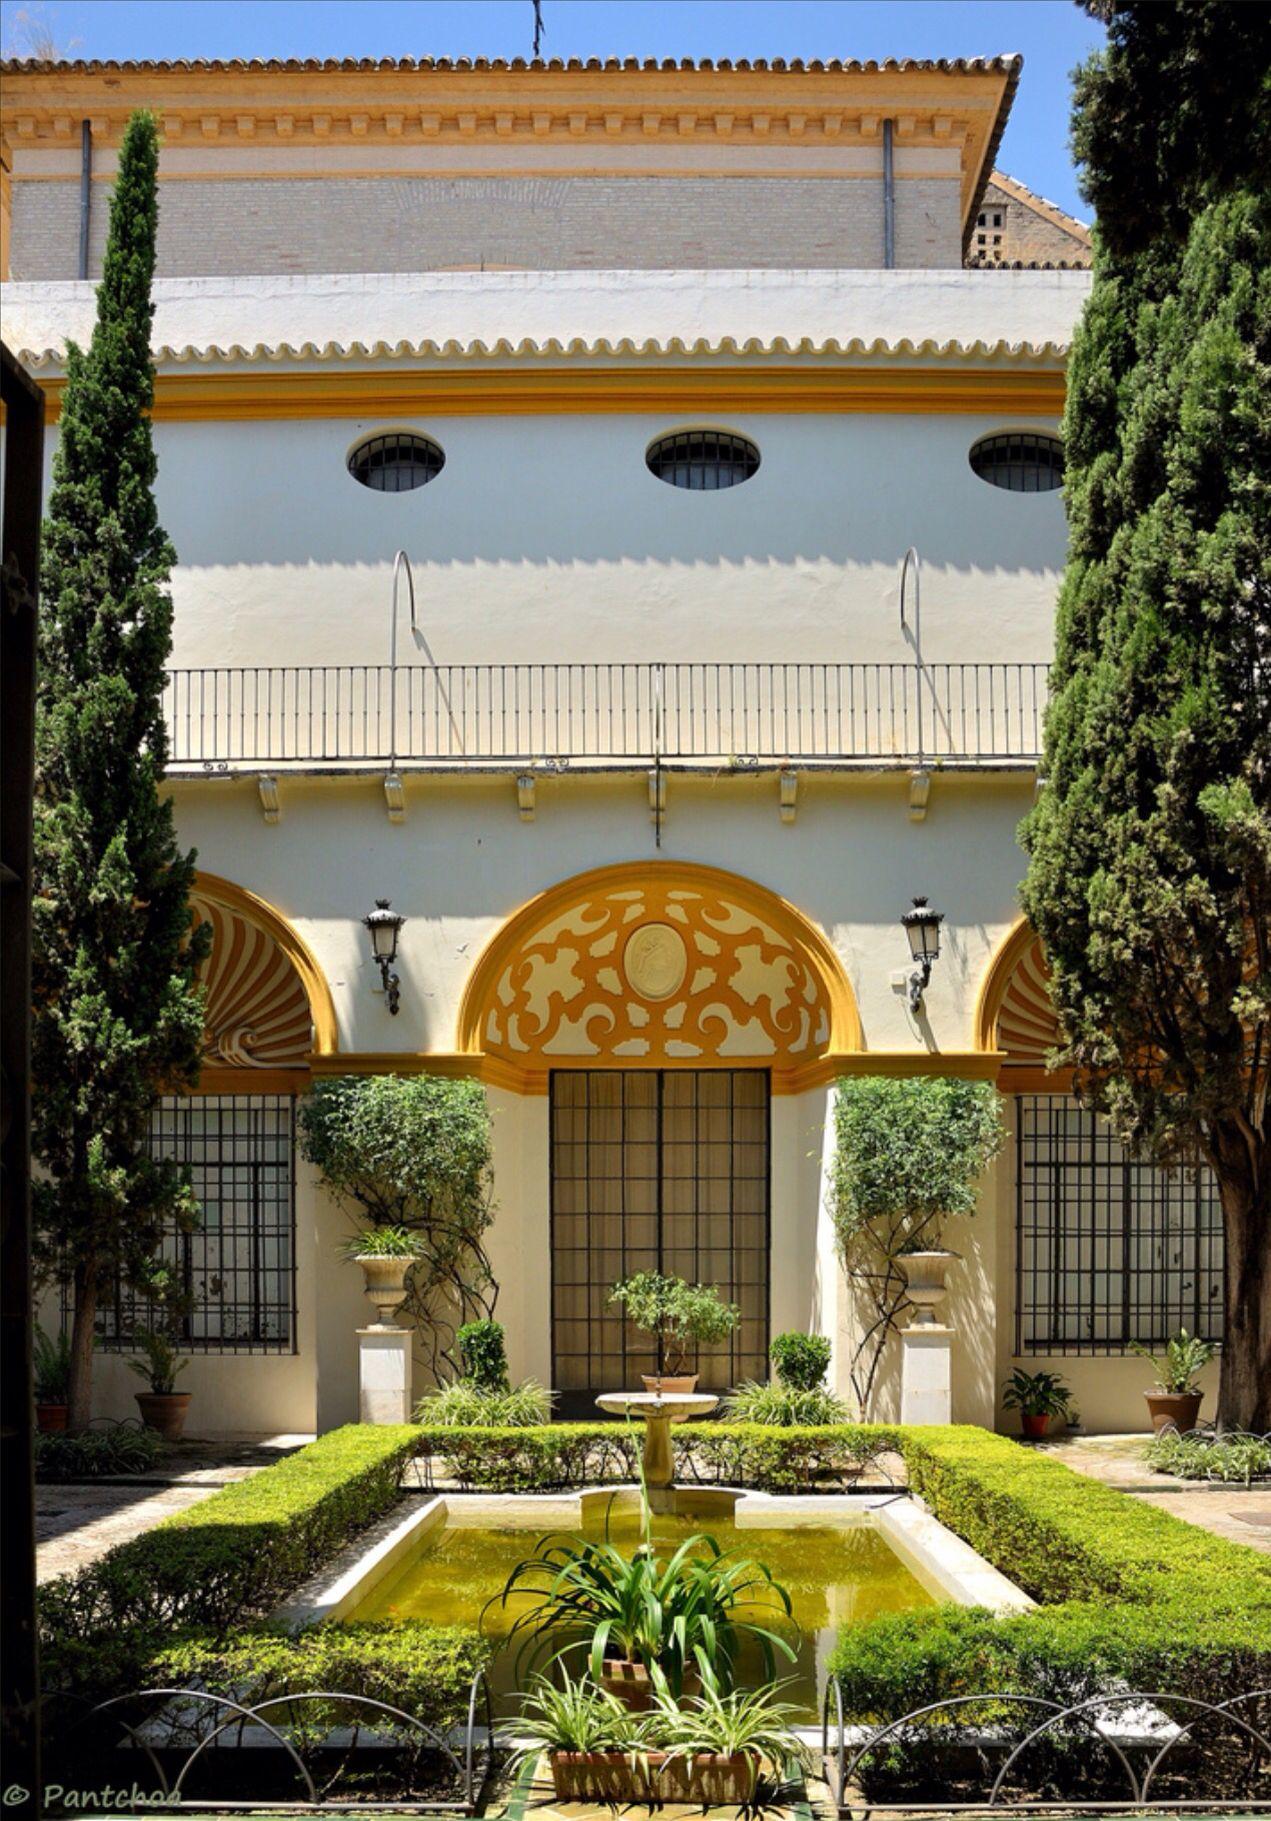 Sevilla Museo De Bellas Artes Patio Https Www Flickr Com Photos Francois 2 6197535458 In Photostream Hotel Place Andalusia Baroque Painting